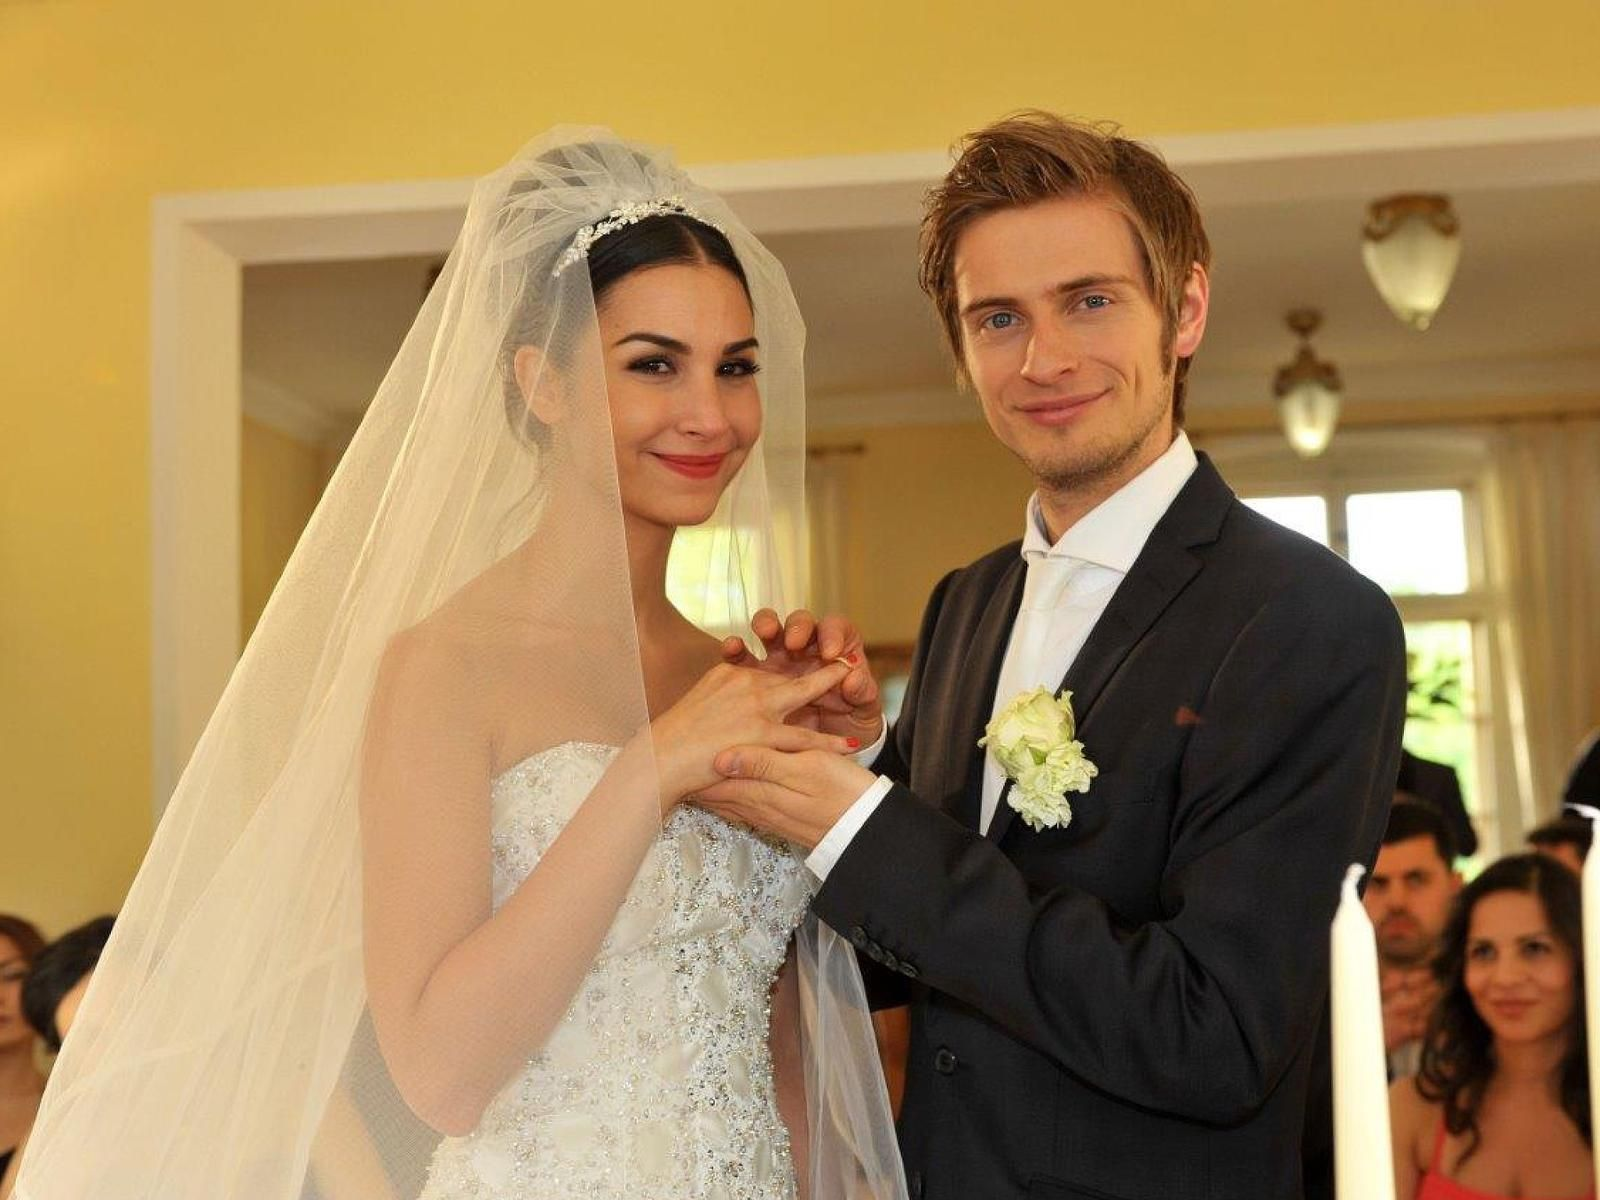 Pin von Angelika auf GZSZ  Gzsz, Hochzeit, Gzsz stars